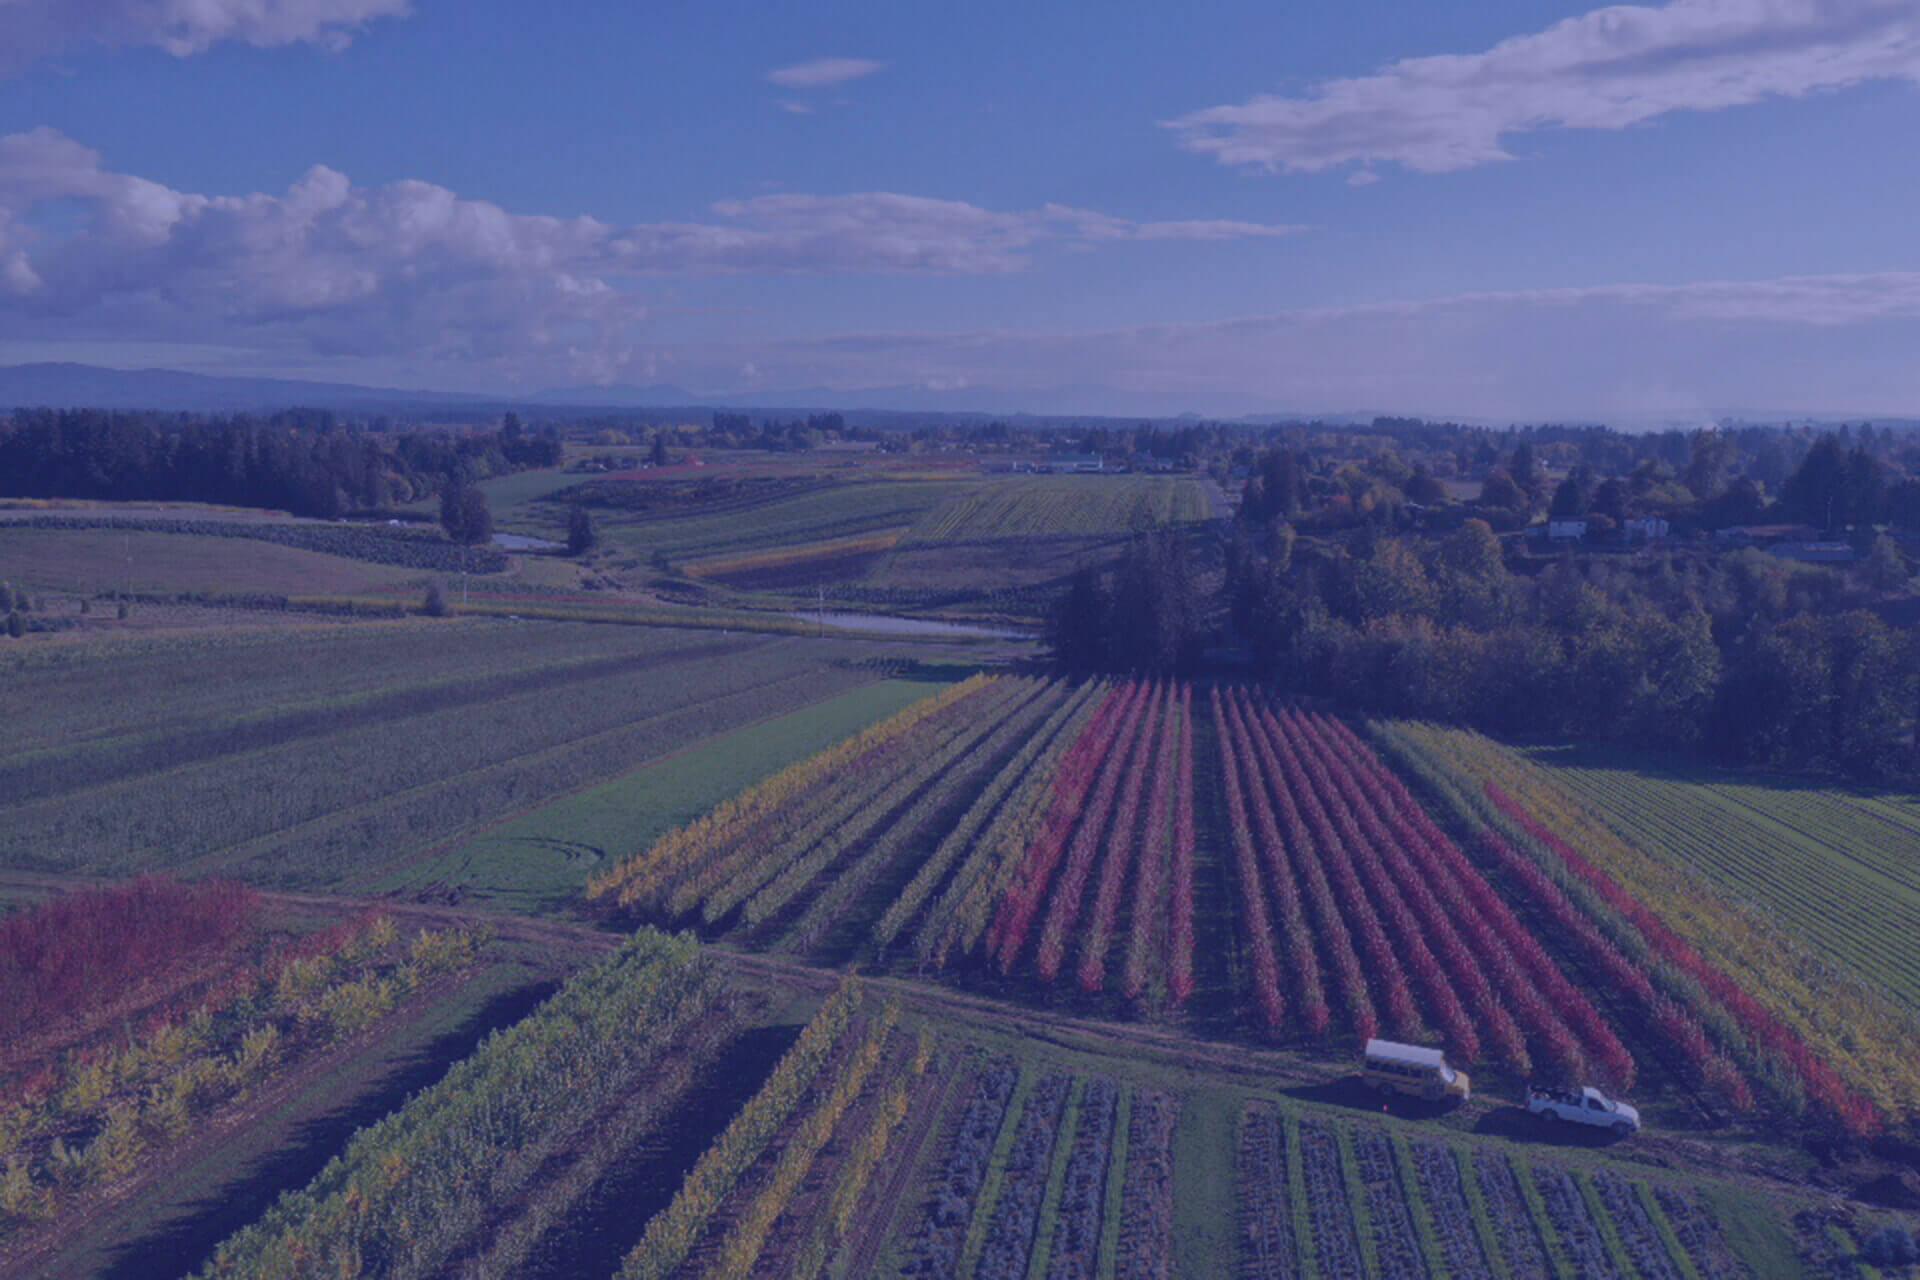 Sester Farms Image